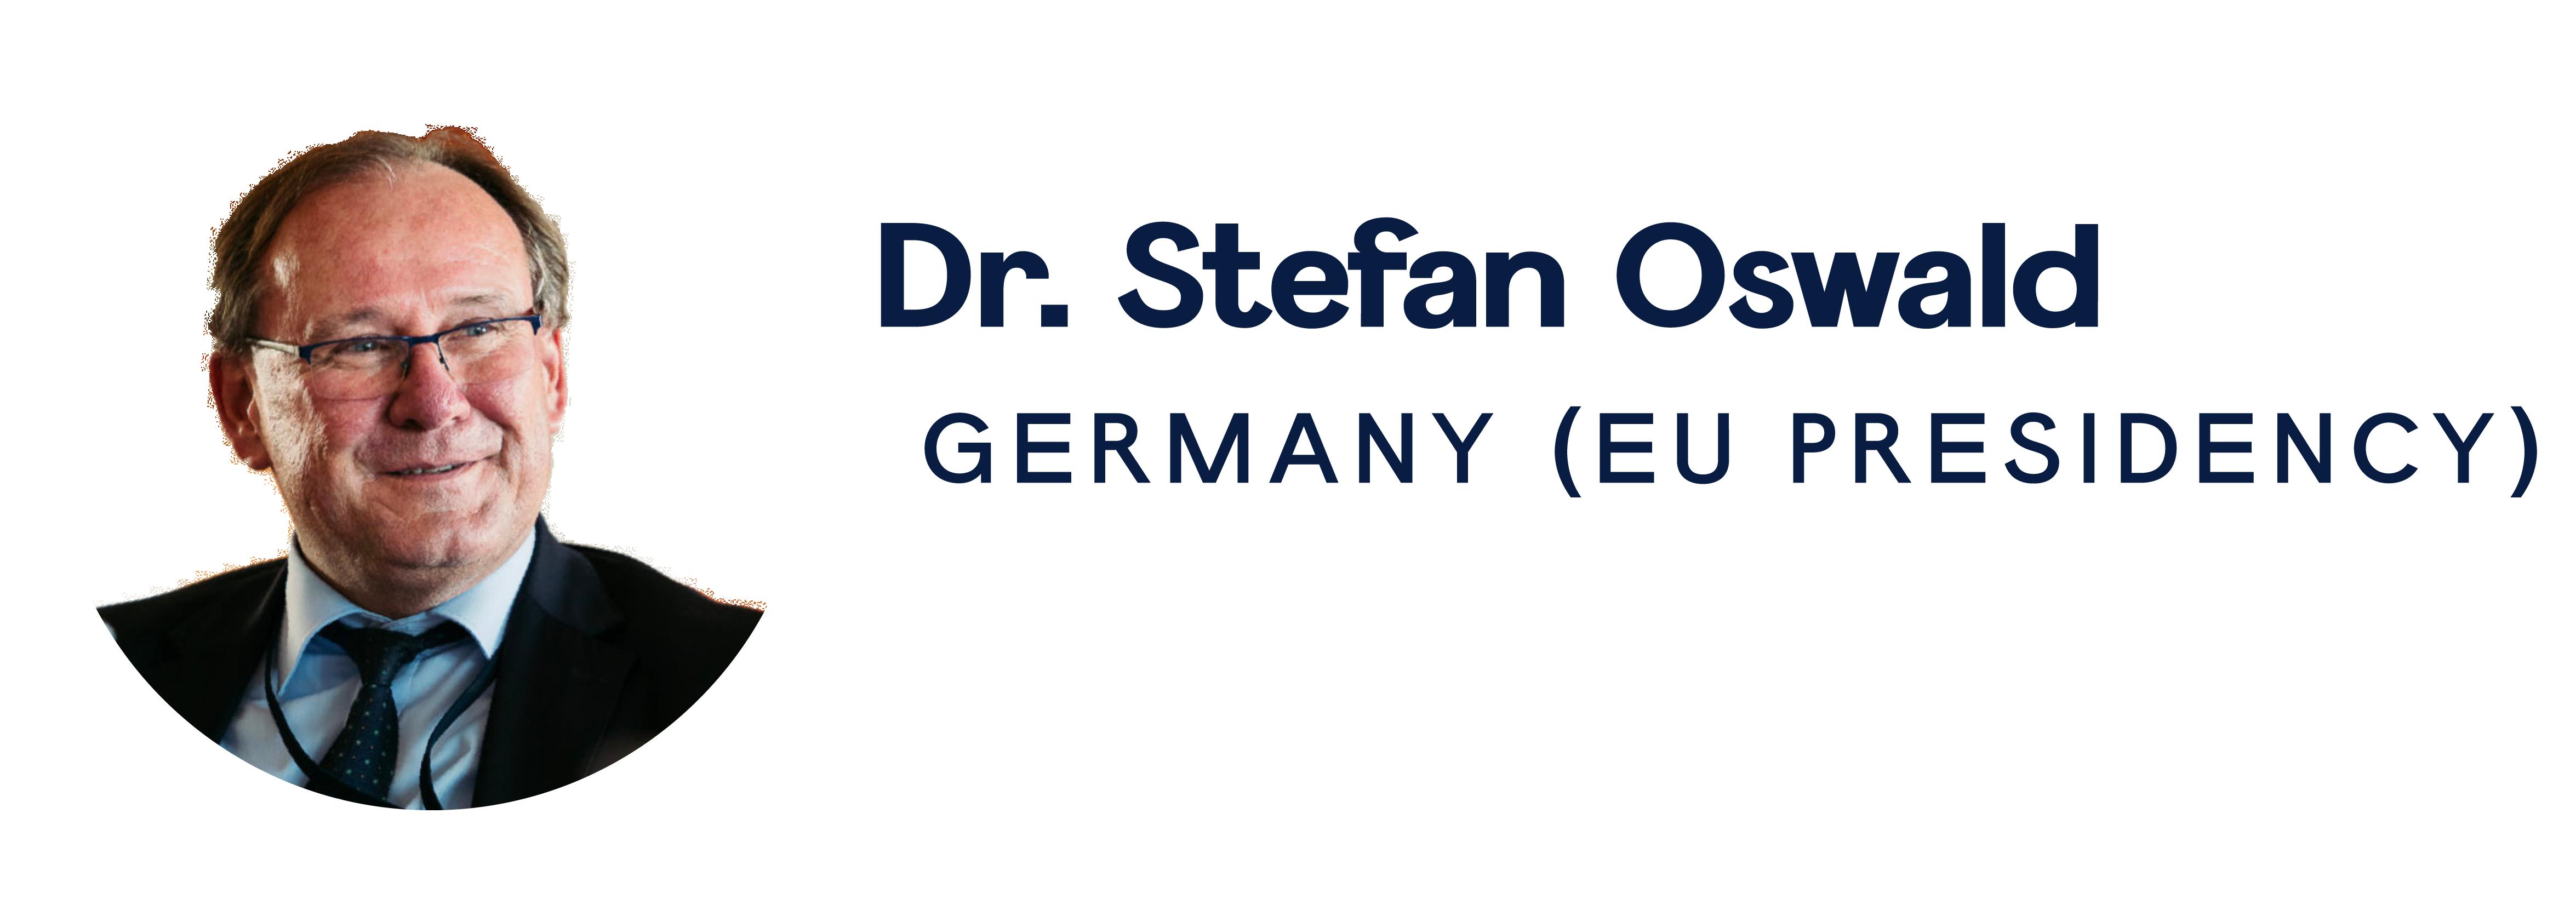 Dr. Stefan Oswald_1